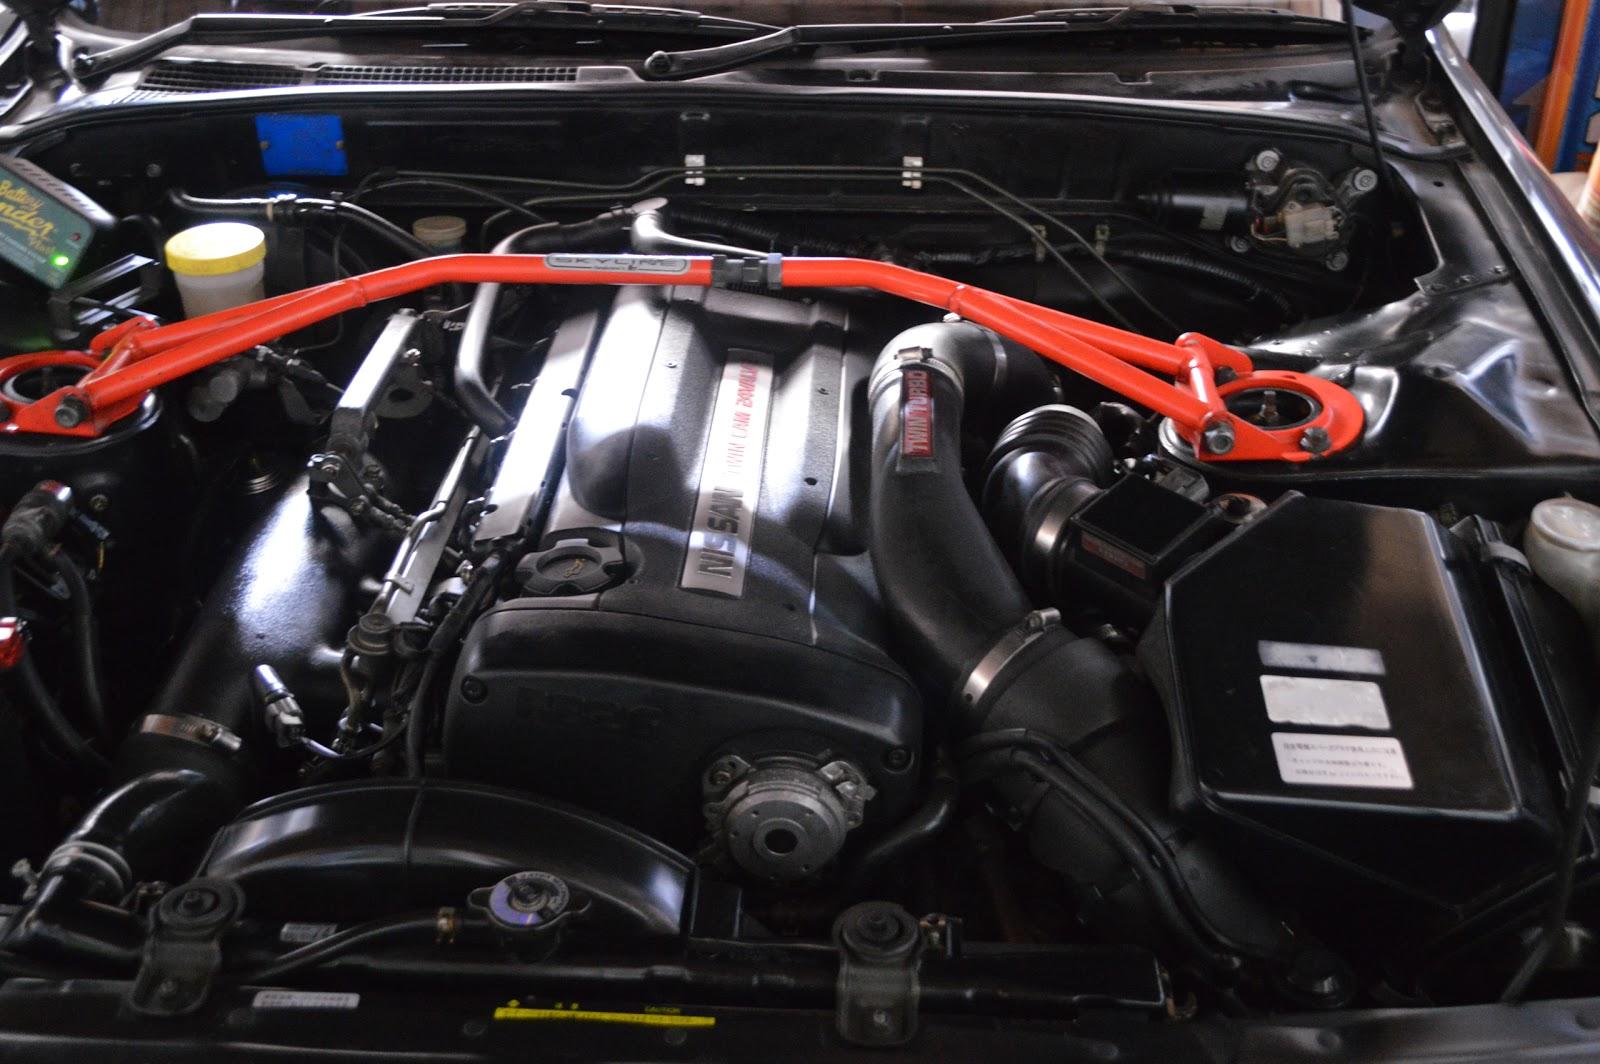 Nissan 30542-12U00 OEM Clutch Fork Dust Boot Cover RB26DETT R32 R33 RB25DET R34